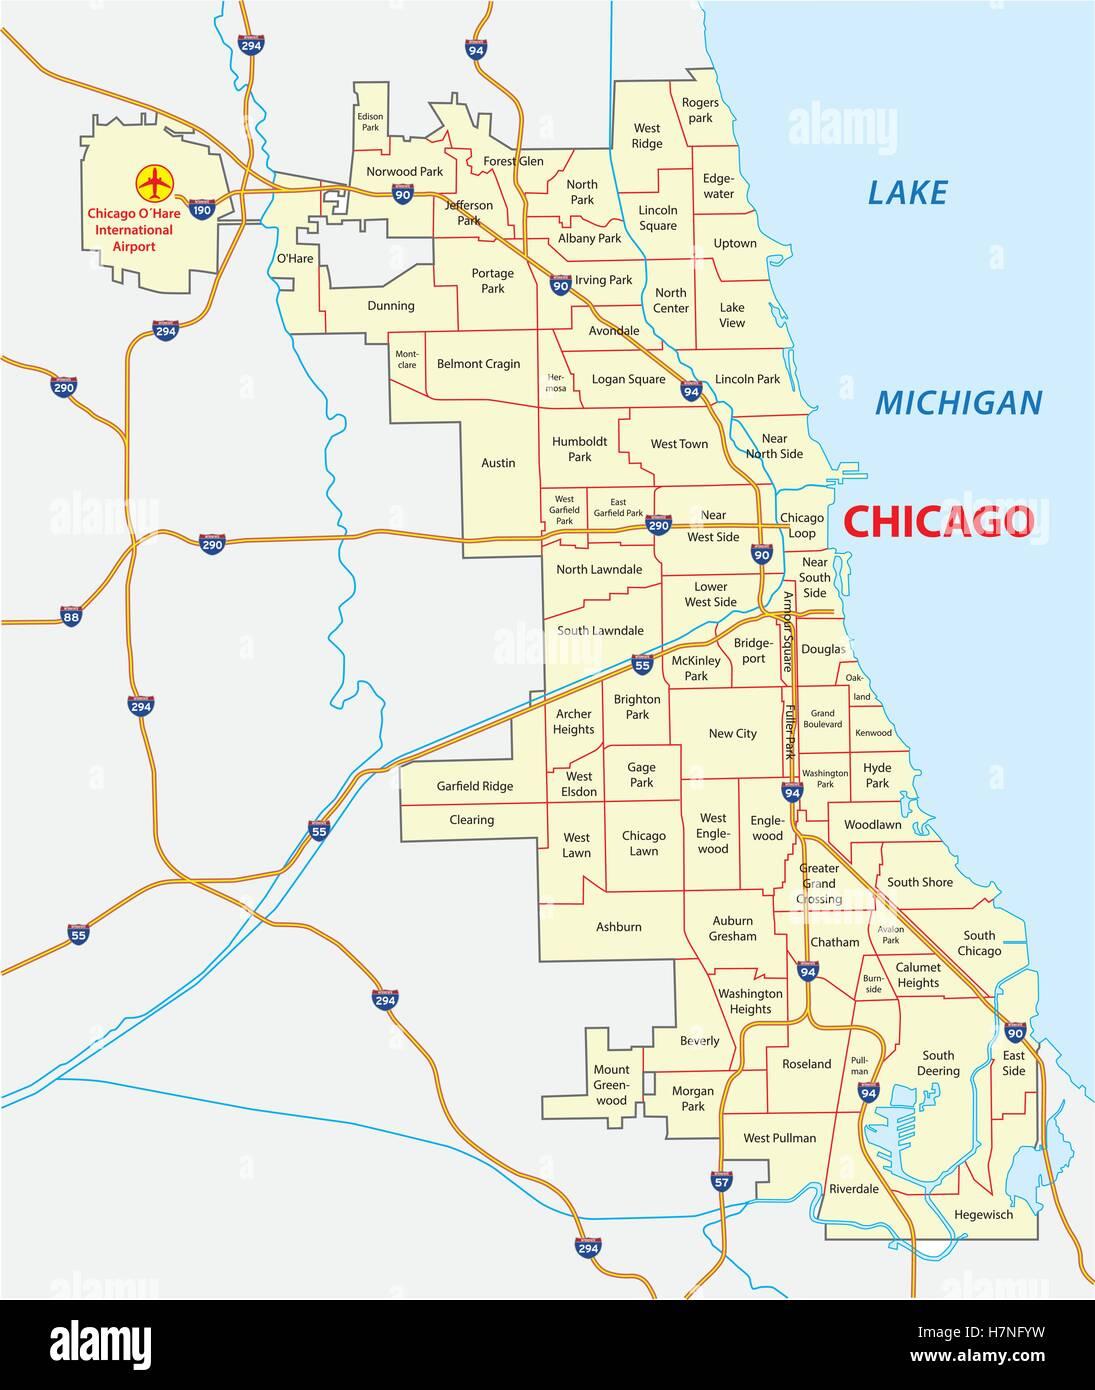 chicago community areas map Stock Vector Art Illustration Vector